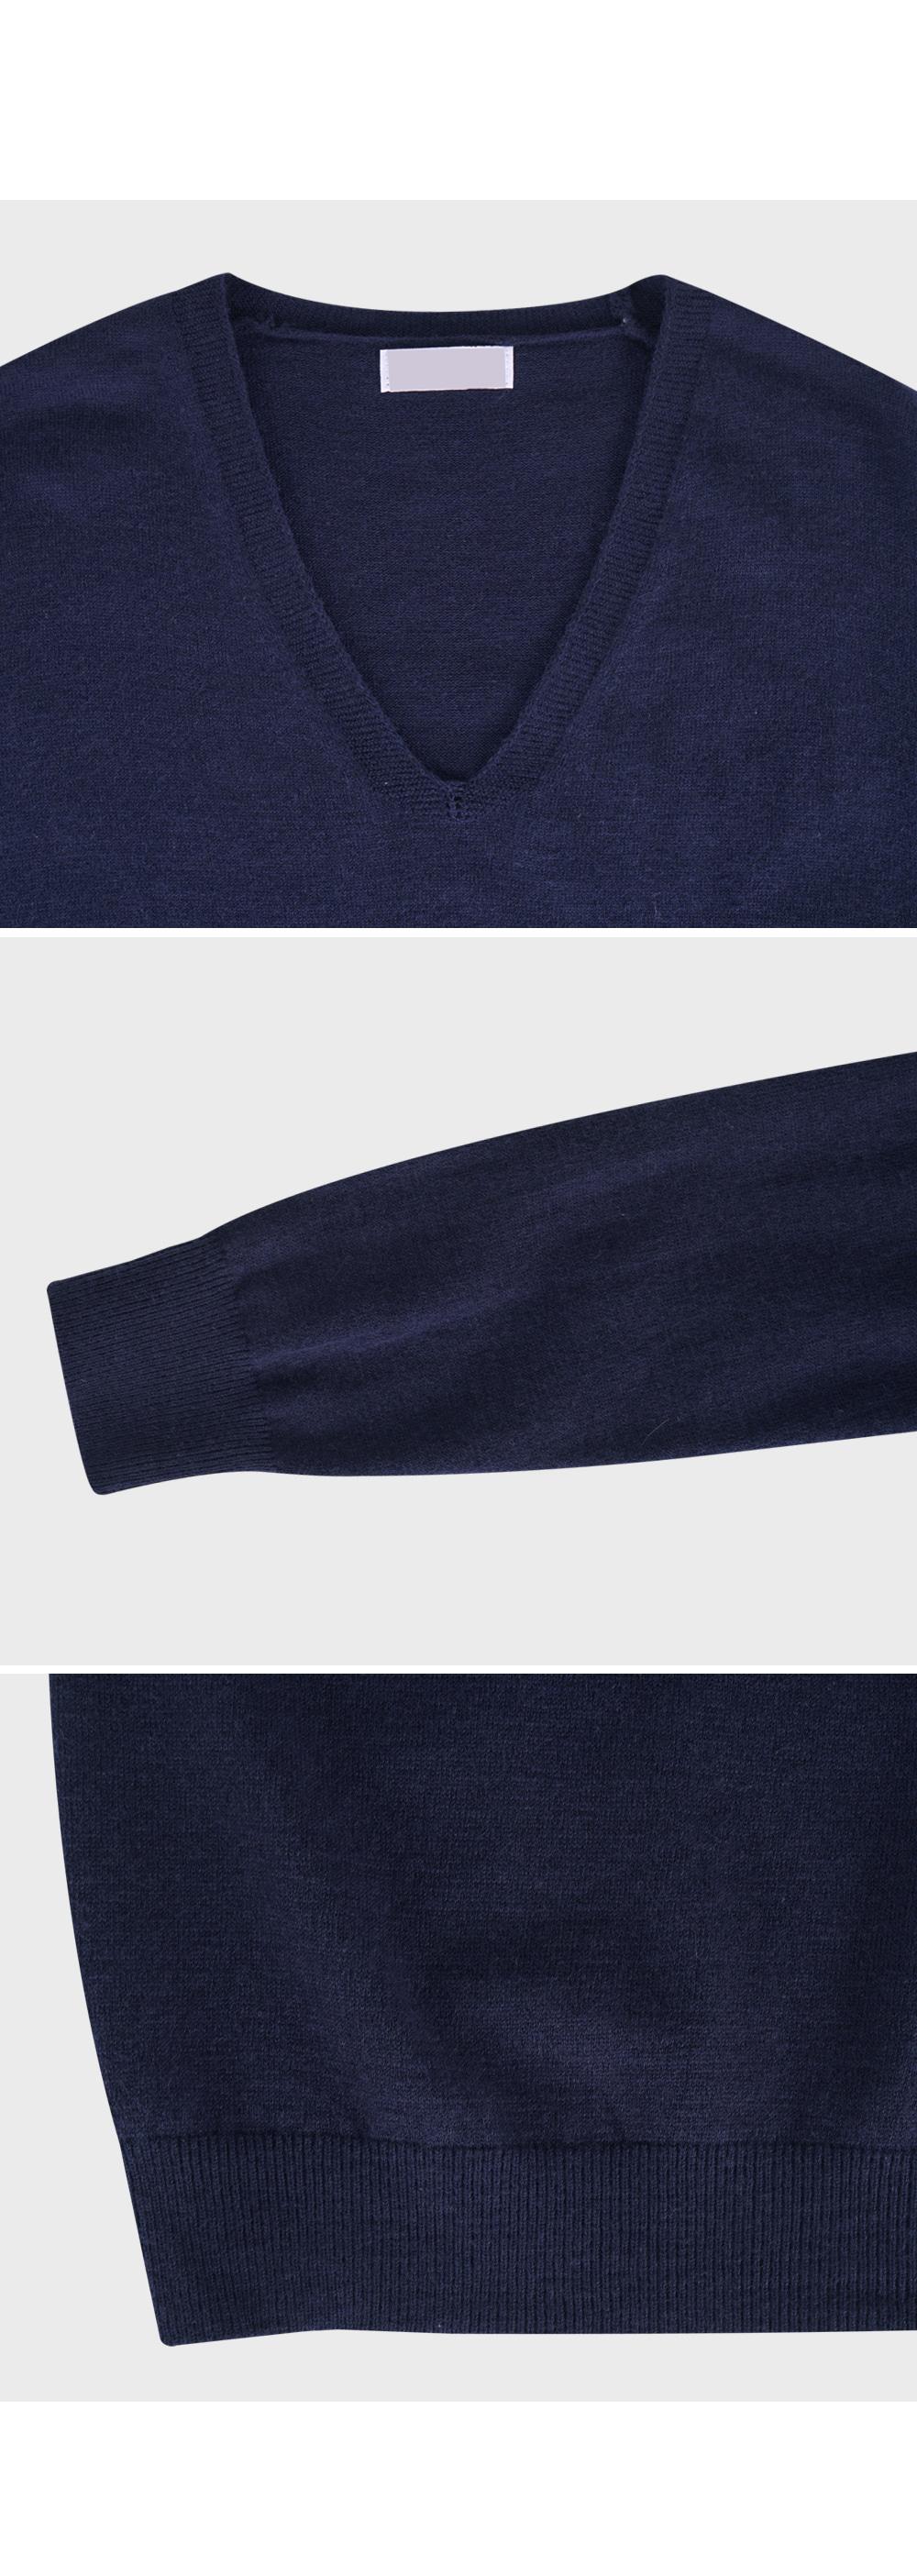 Tunic V Neck Knit-holiholic.com